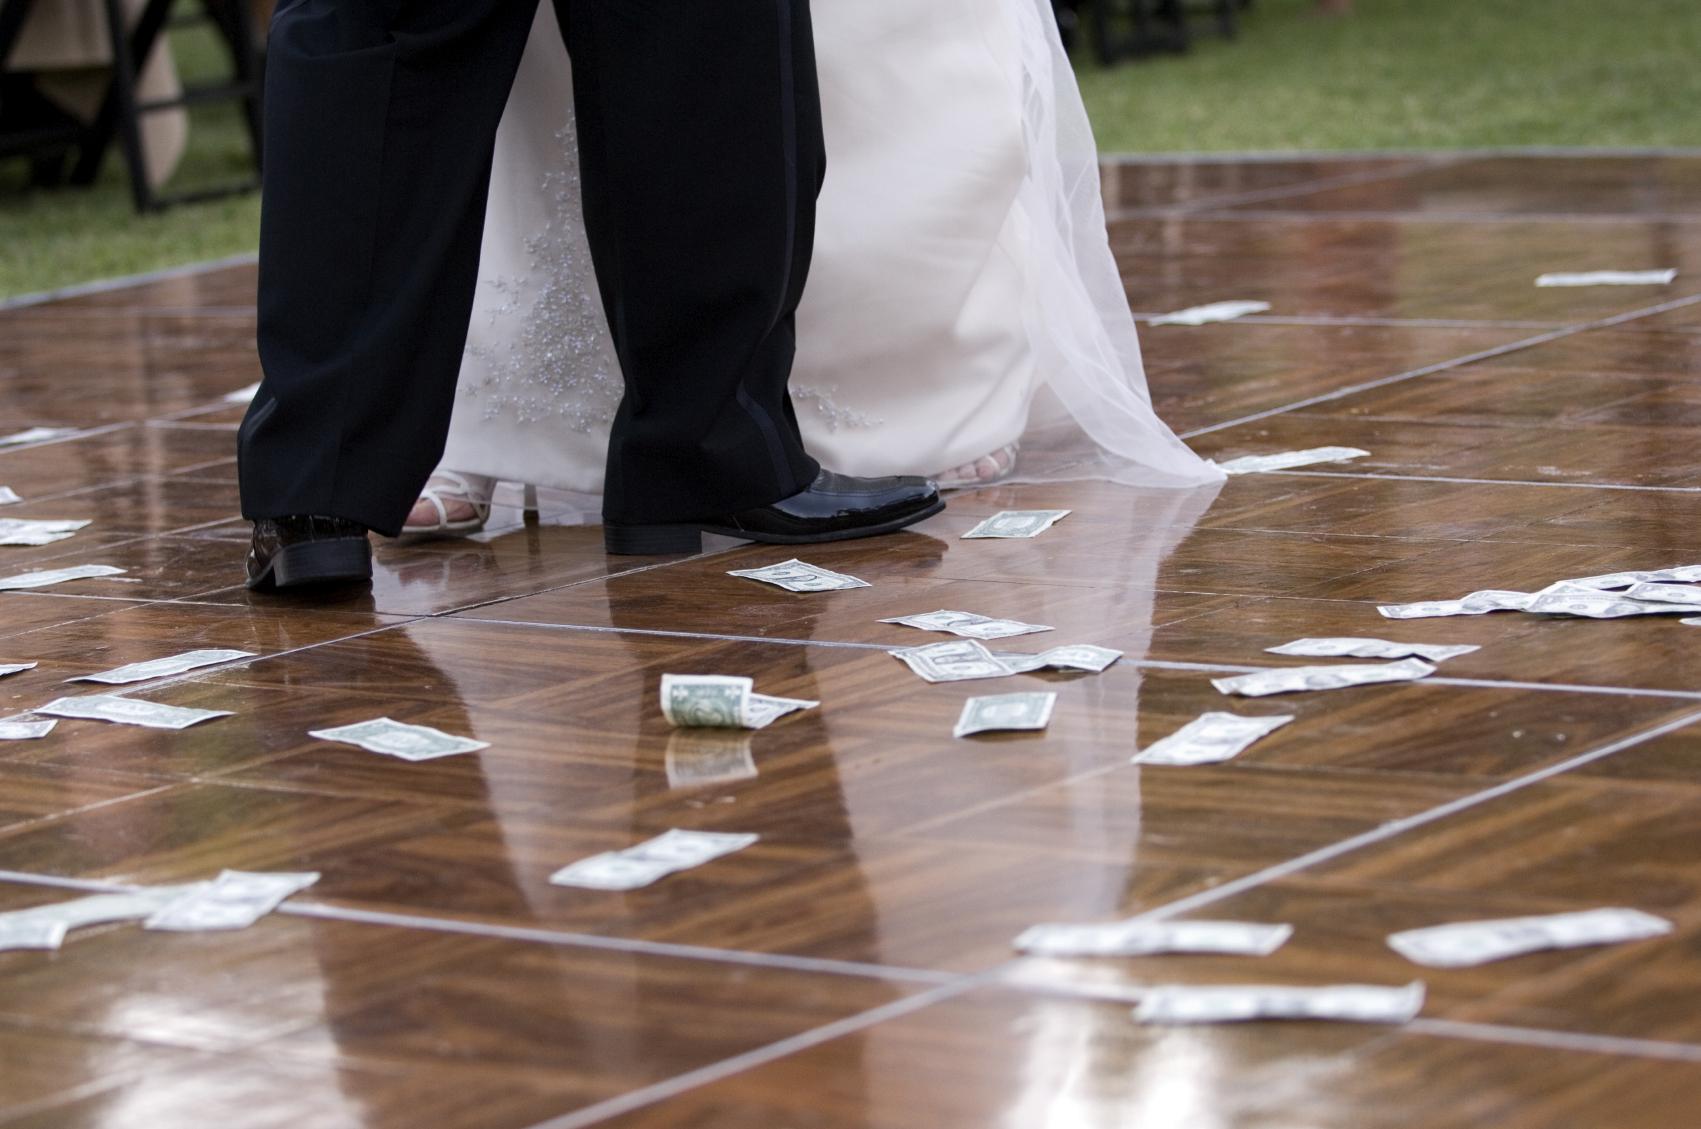 Money Dance Wedding.The Dollar Dance Wedding Etiquette Demystified What You